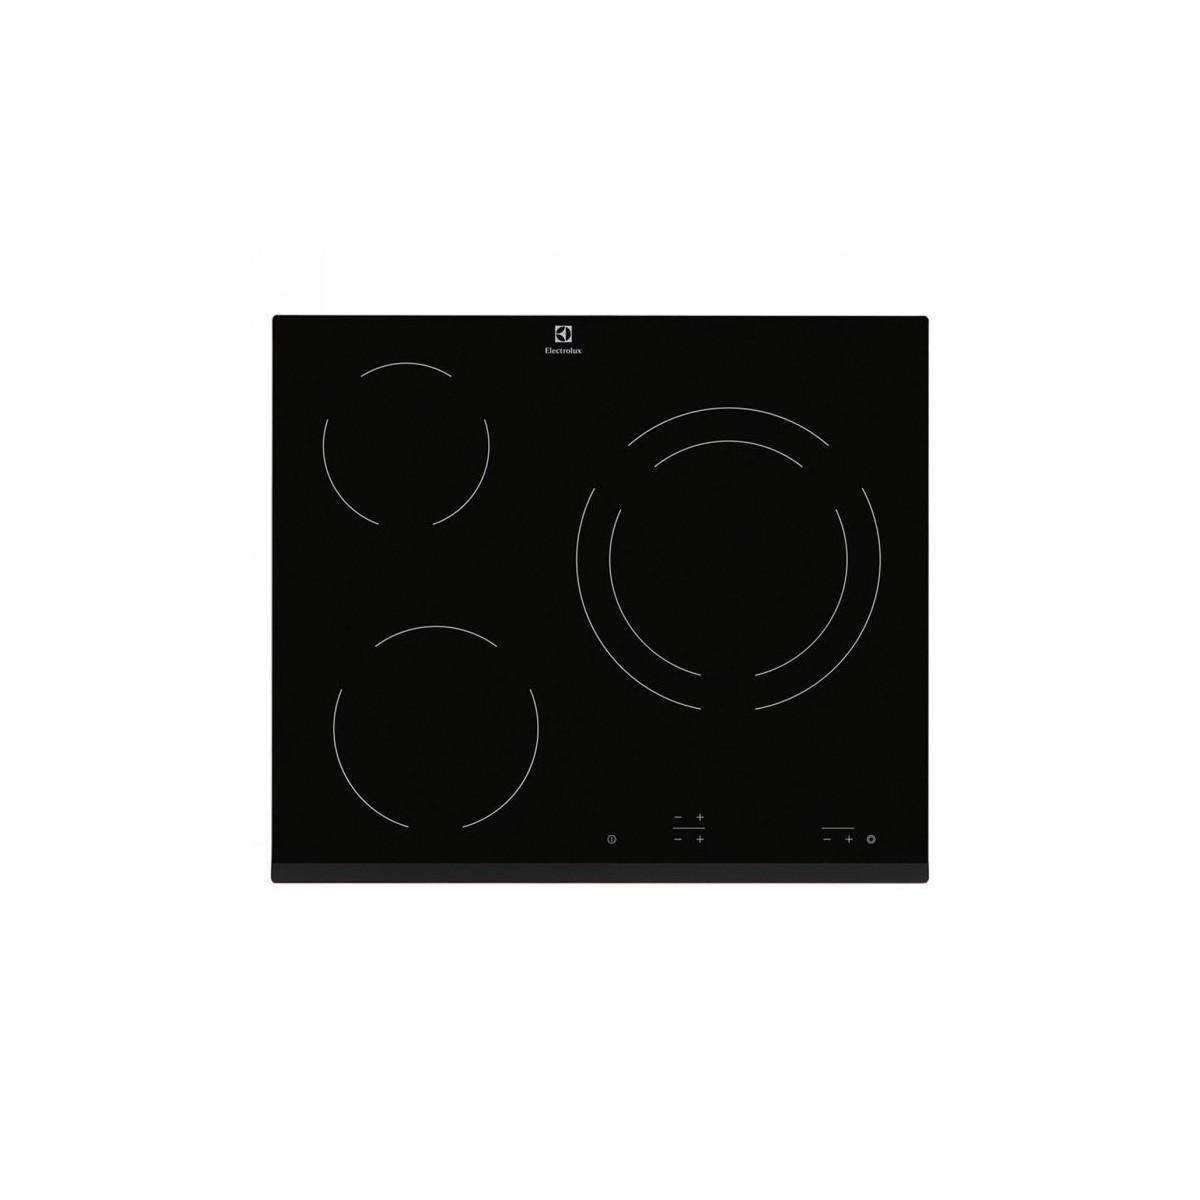 Placa vitrocerámica Electrolux EHF6231FOK biselado 60cm